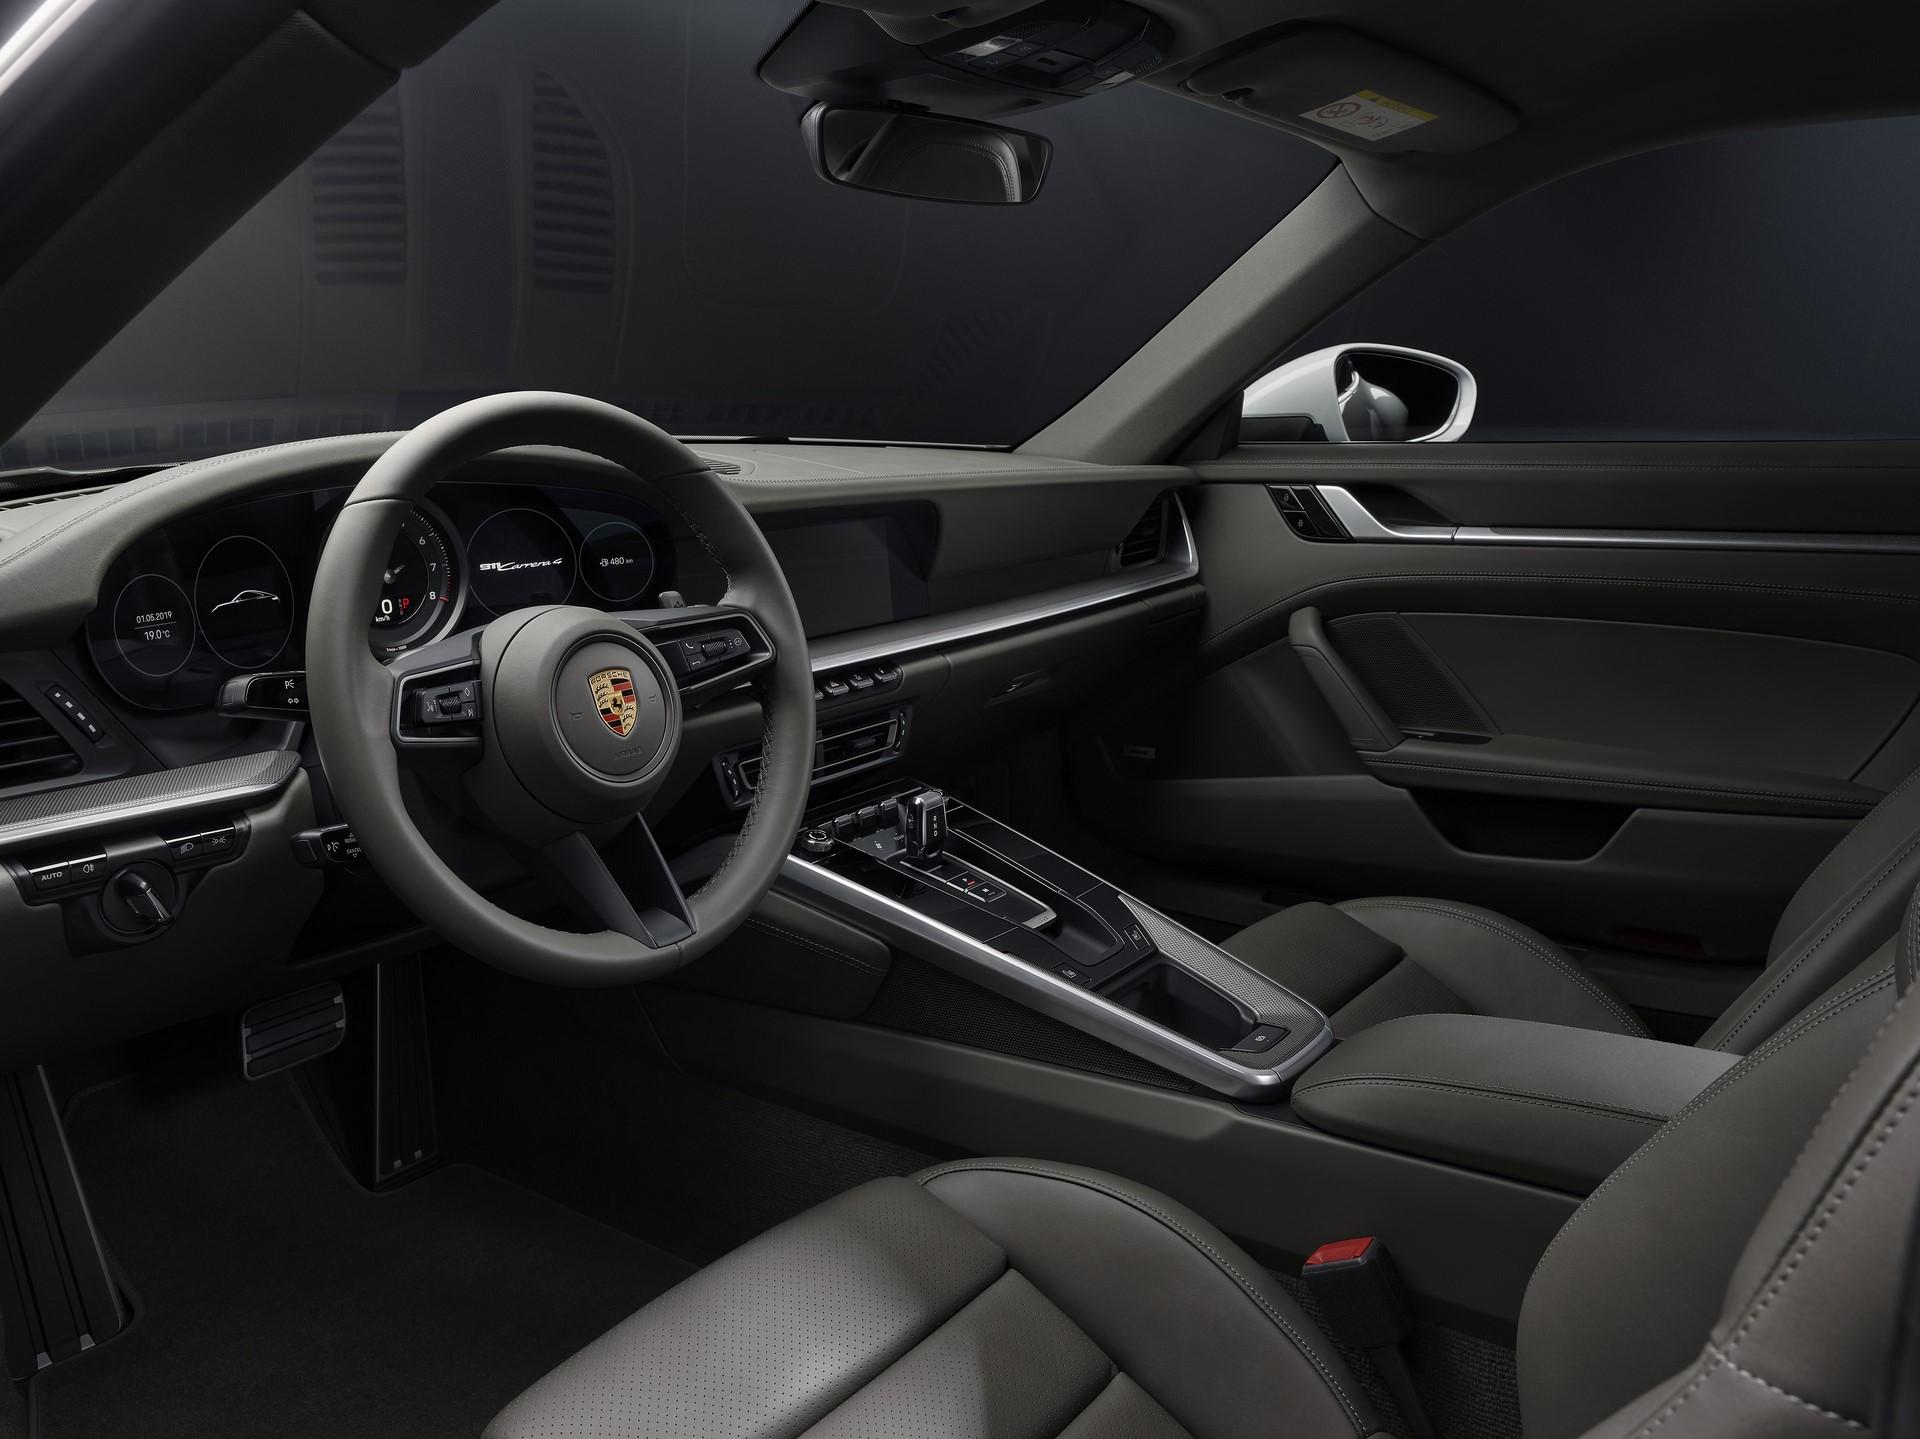 Porsche-911-Carrera-4-Coupe-and-Cabriolet-2020-4